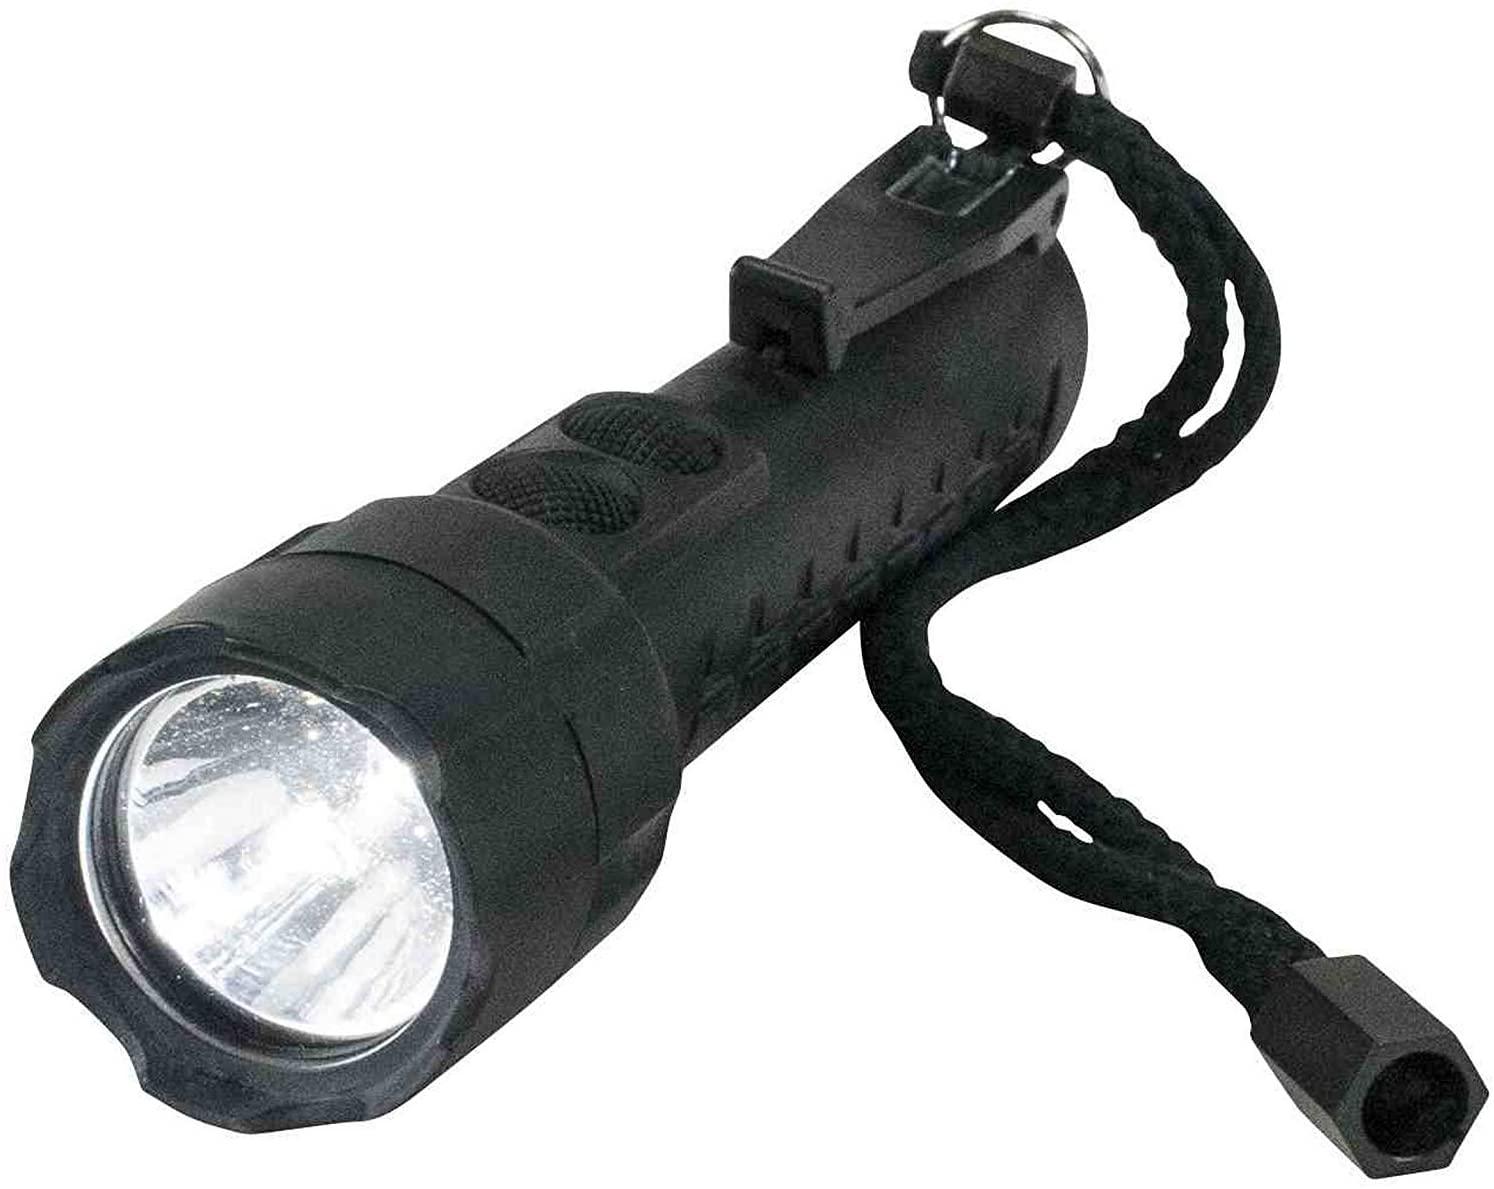 Intrinsically Safe - Dual Beam- LED Flashlight - Push Button Switch - 240 Lumens